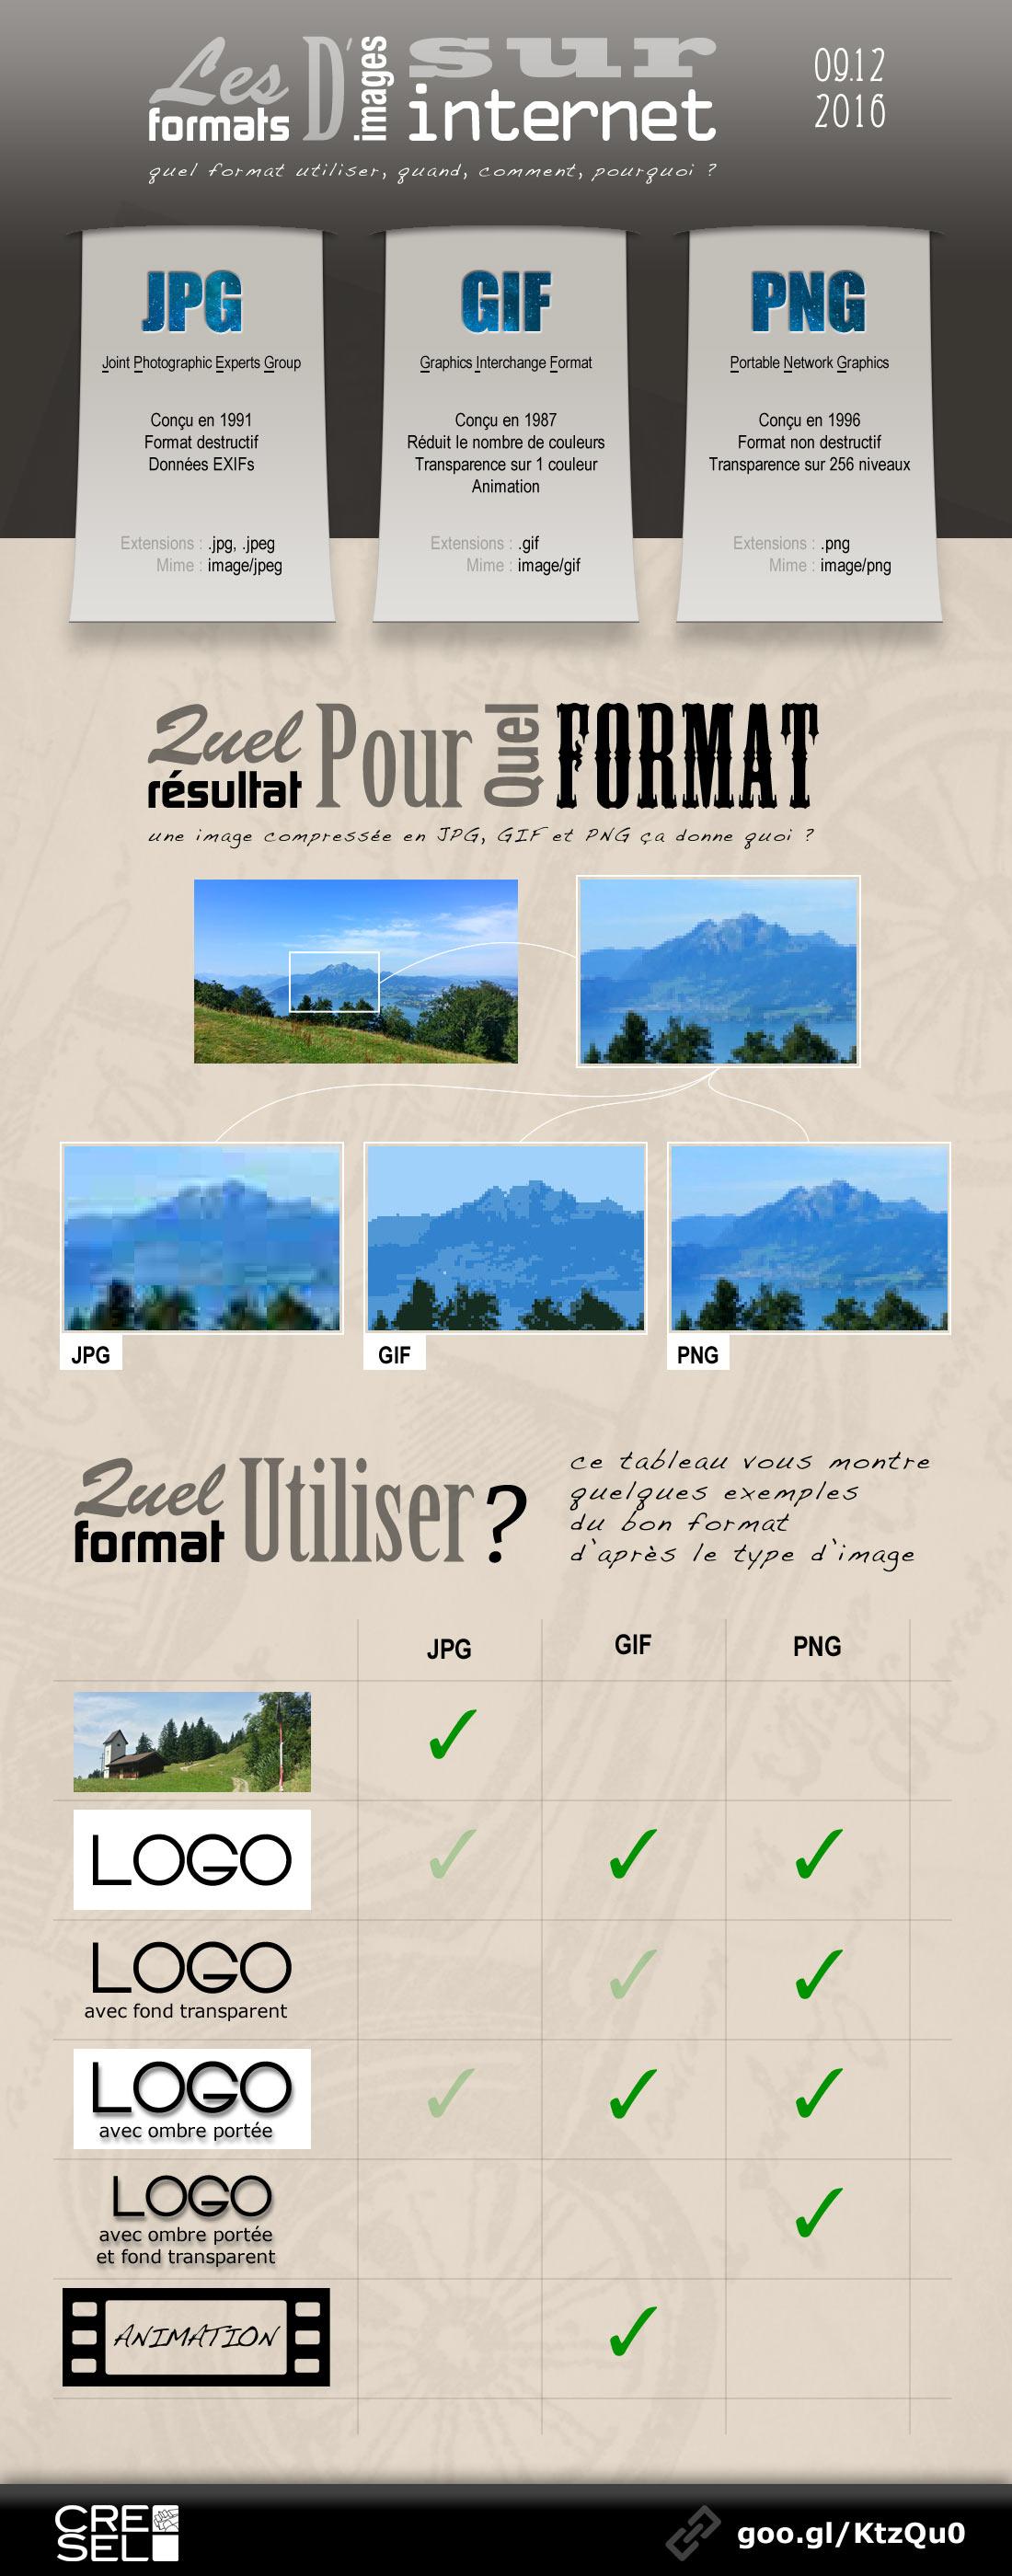 Infographie : PNG, GIF, JPG quel format d'image choisir ?